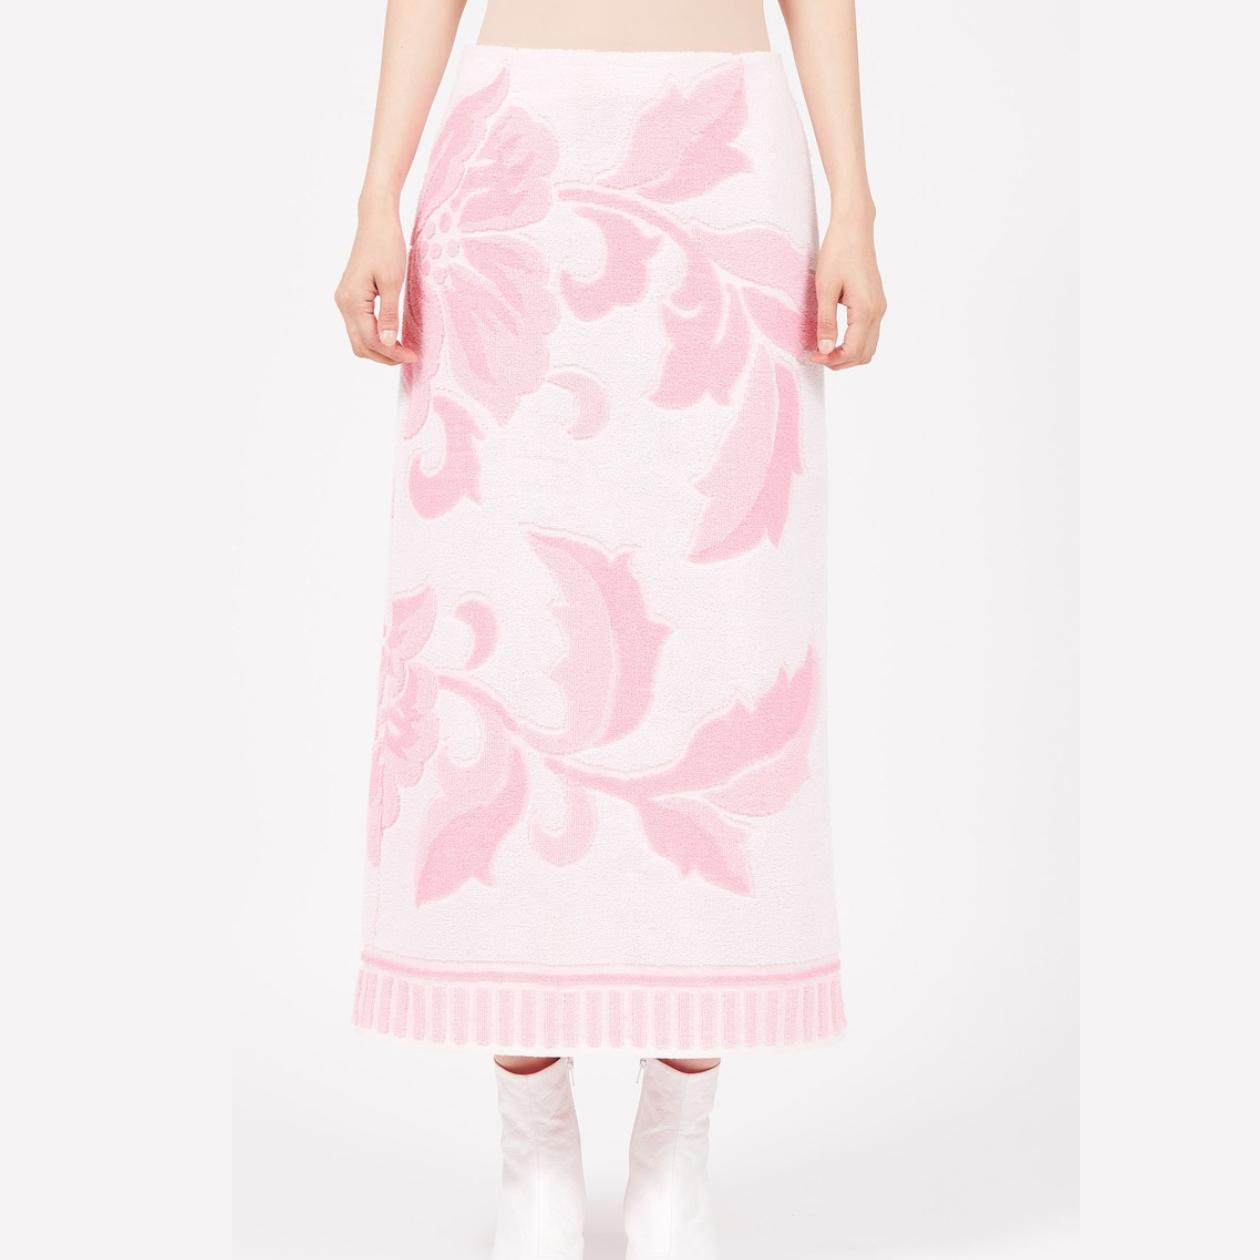 【locat】mm6 Maison Margiela France Product 2020 Rose Slit-Back Skirt.